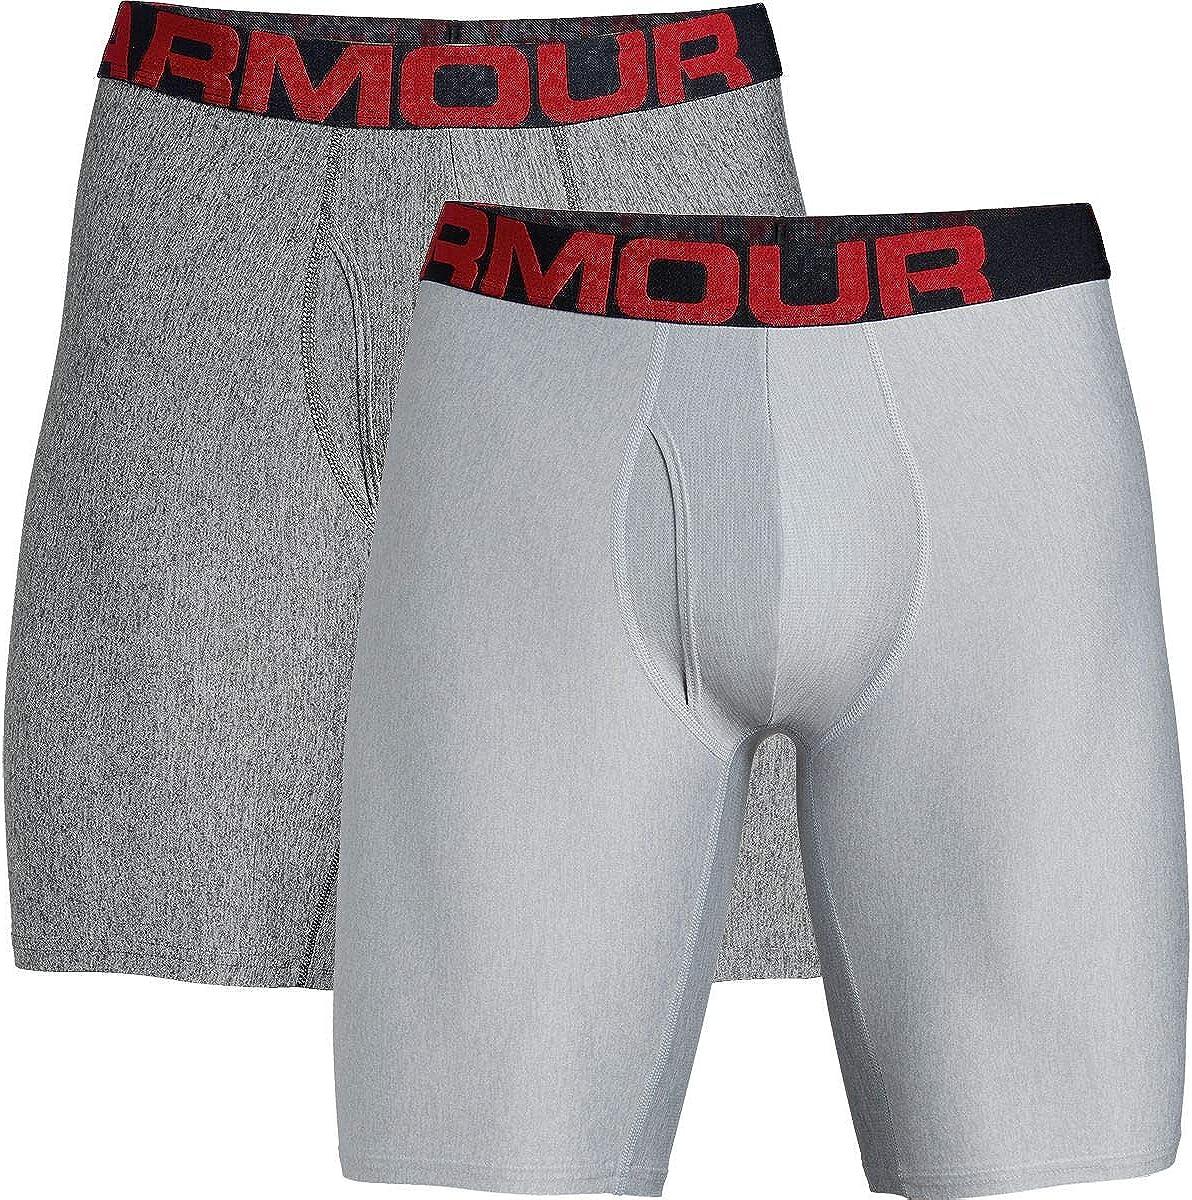 Under Armour Tech 9in Underwear - 2-Pack - Men's Mod Gray Light Heather, M